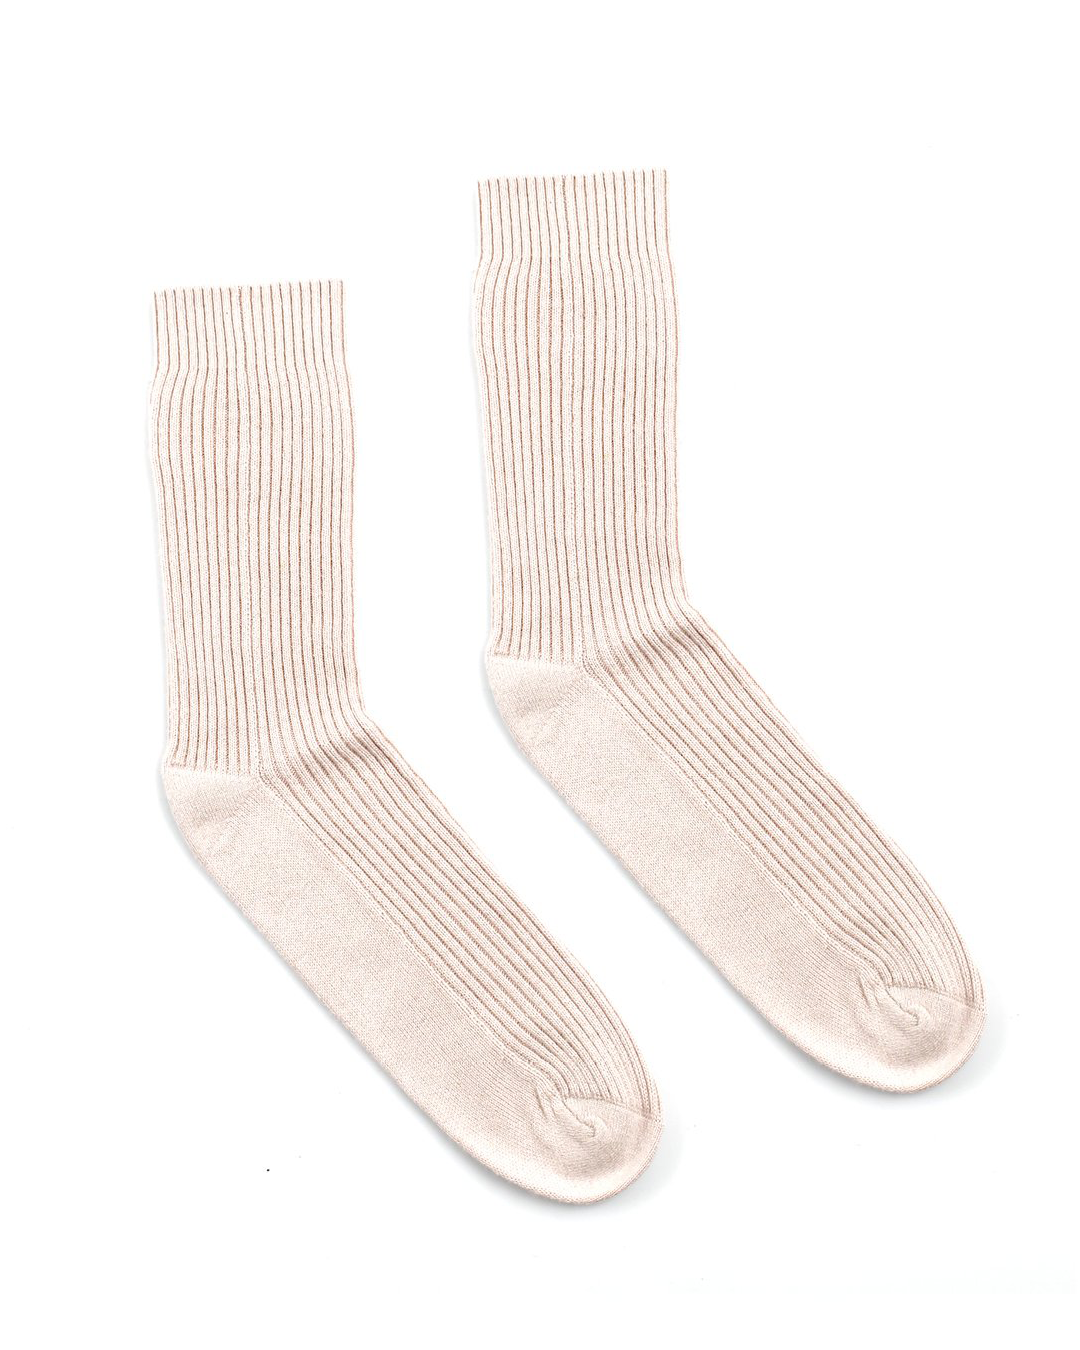 A light blush pair of pink silk socks